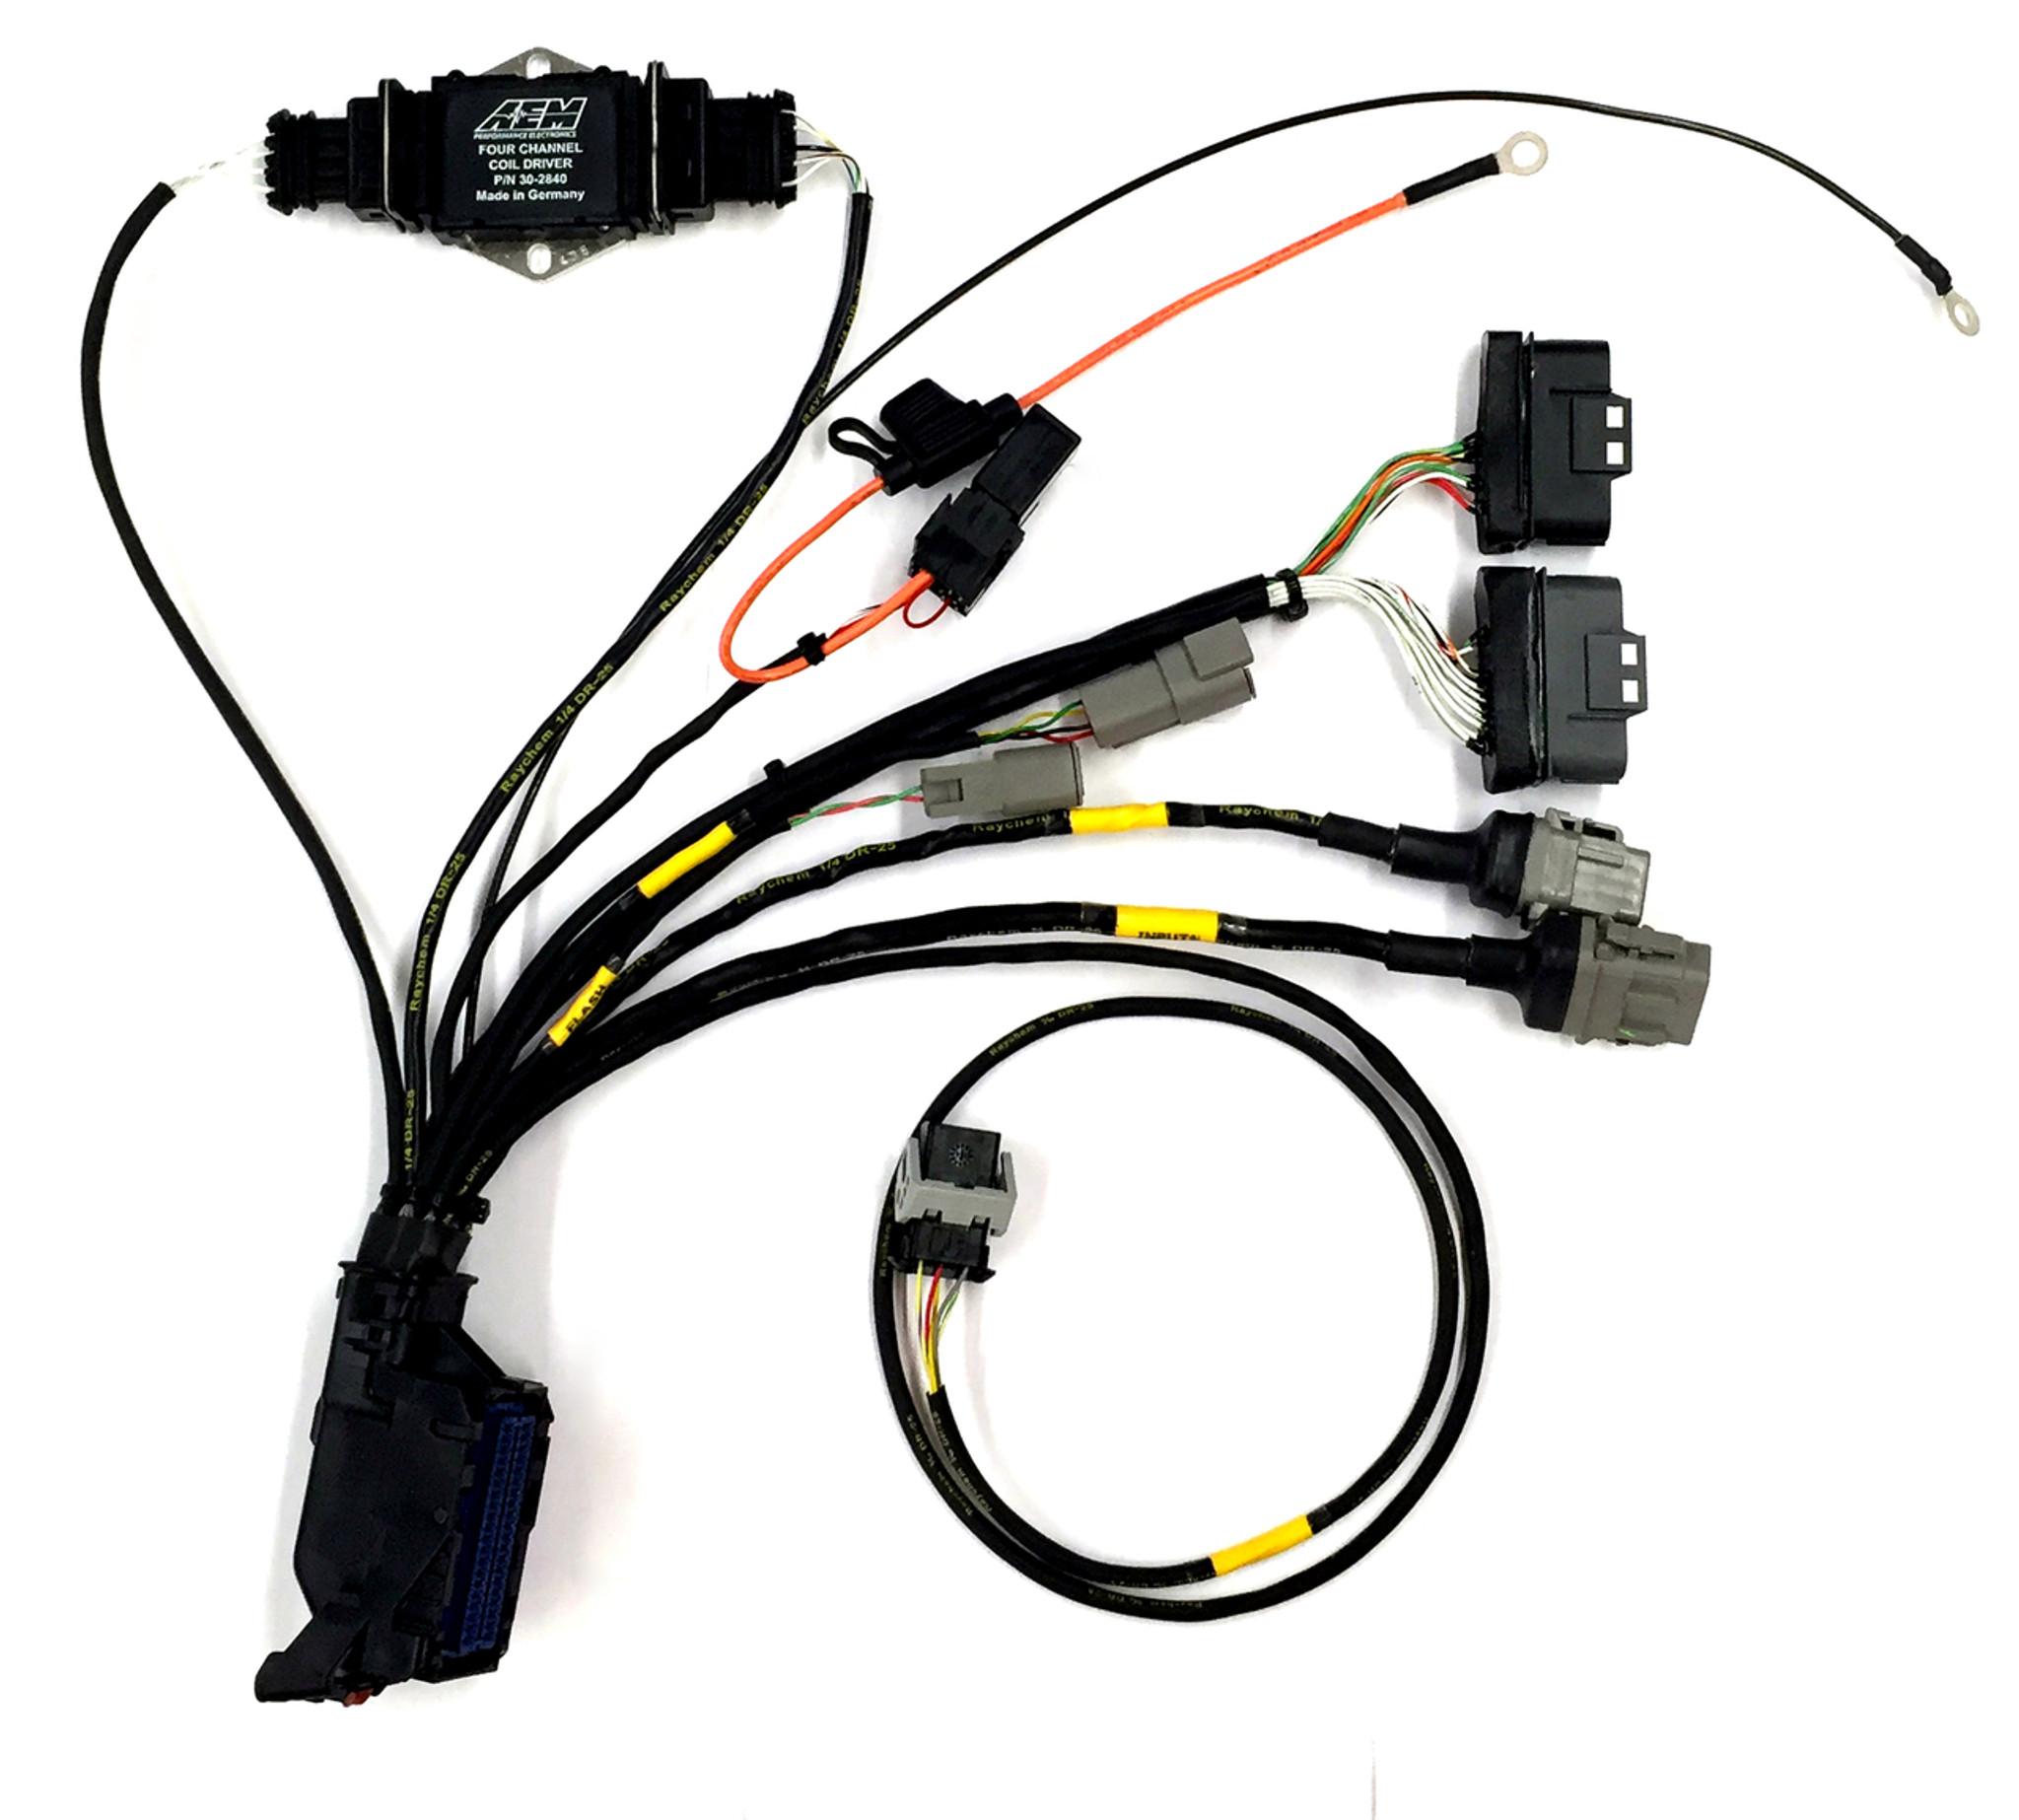 medium resolution of infinity ecu plug and play wiring harness